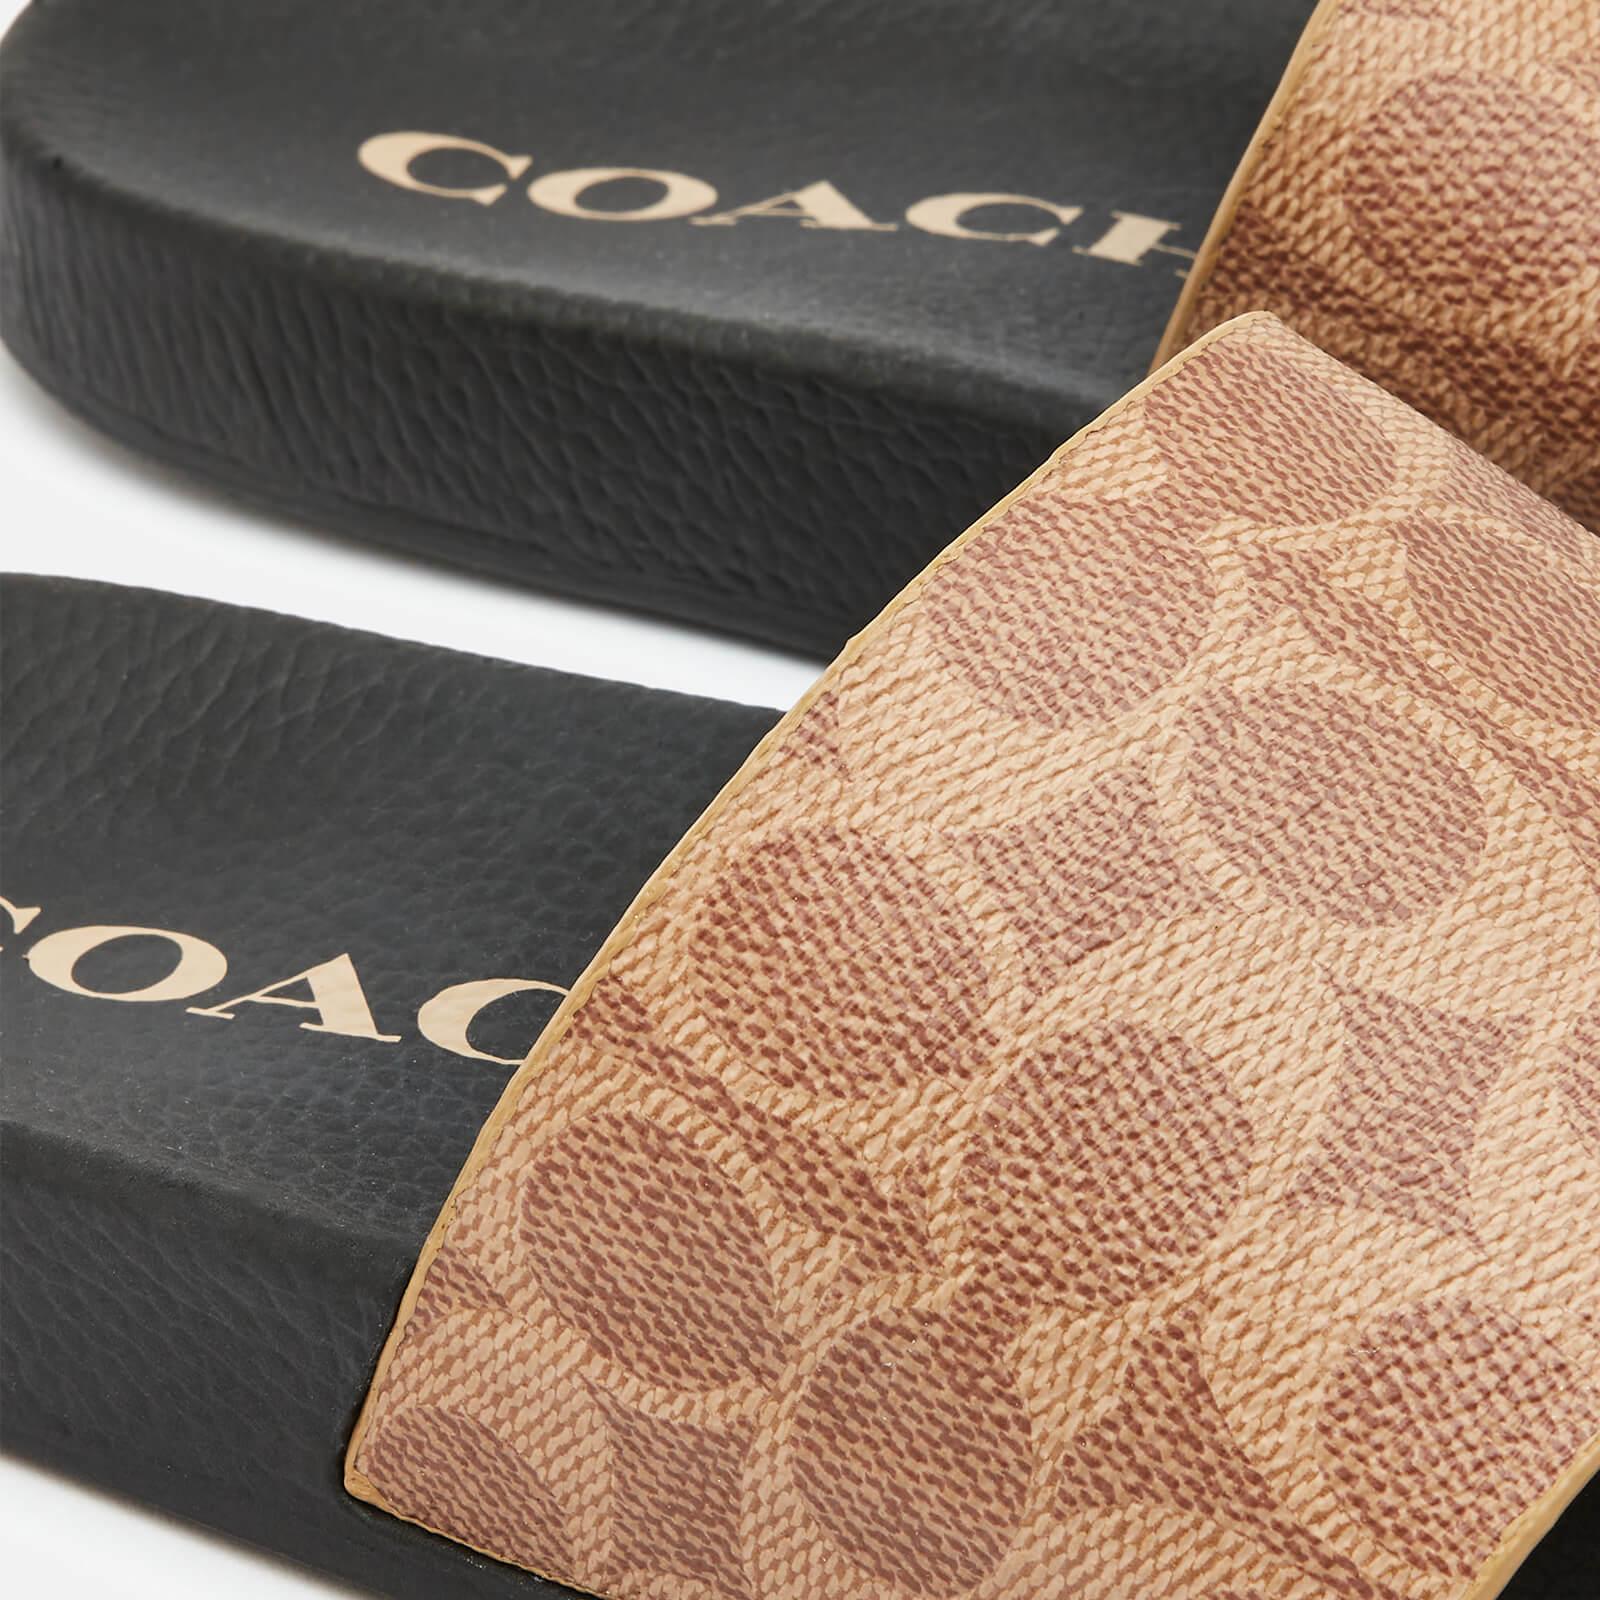 Coach Women's Udele Coated Canvas Slide Sandals - Tan - Uk 3